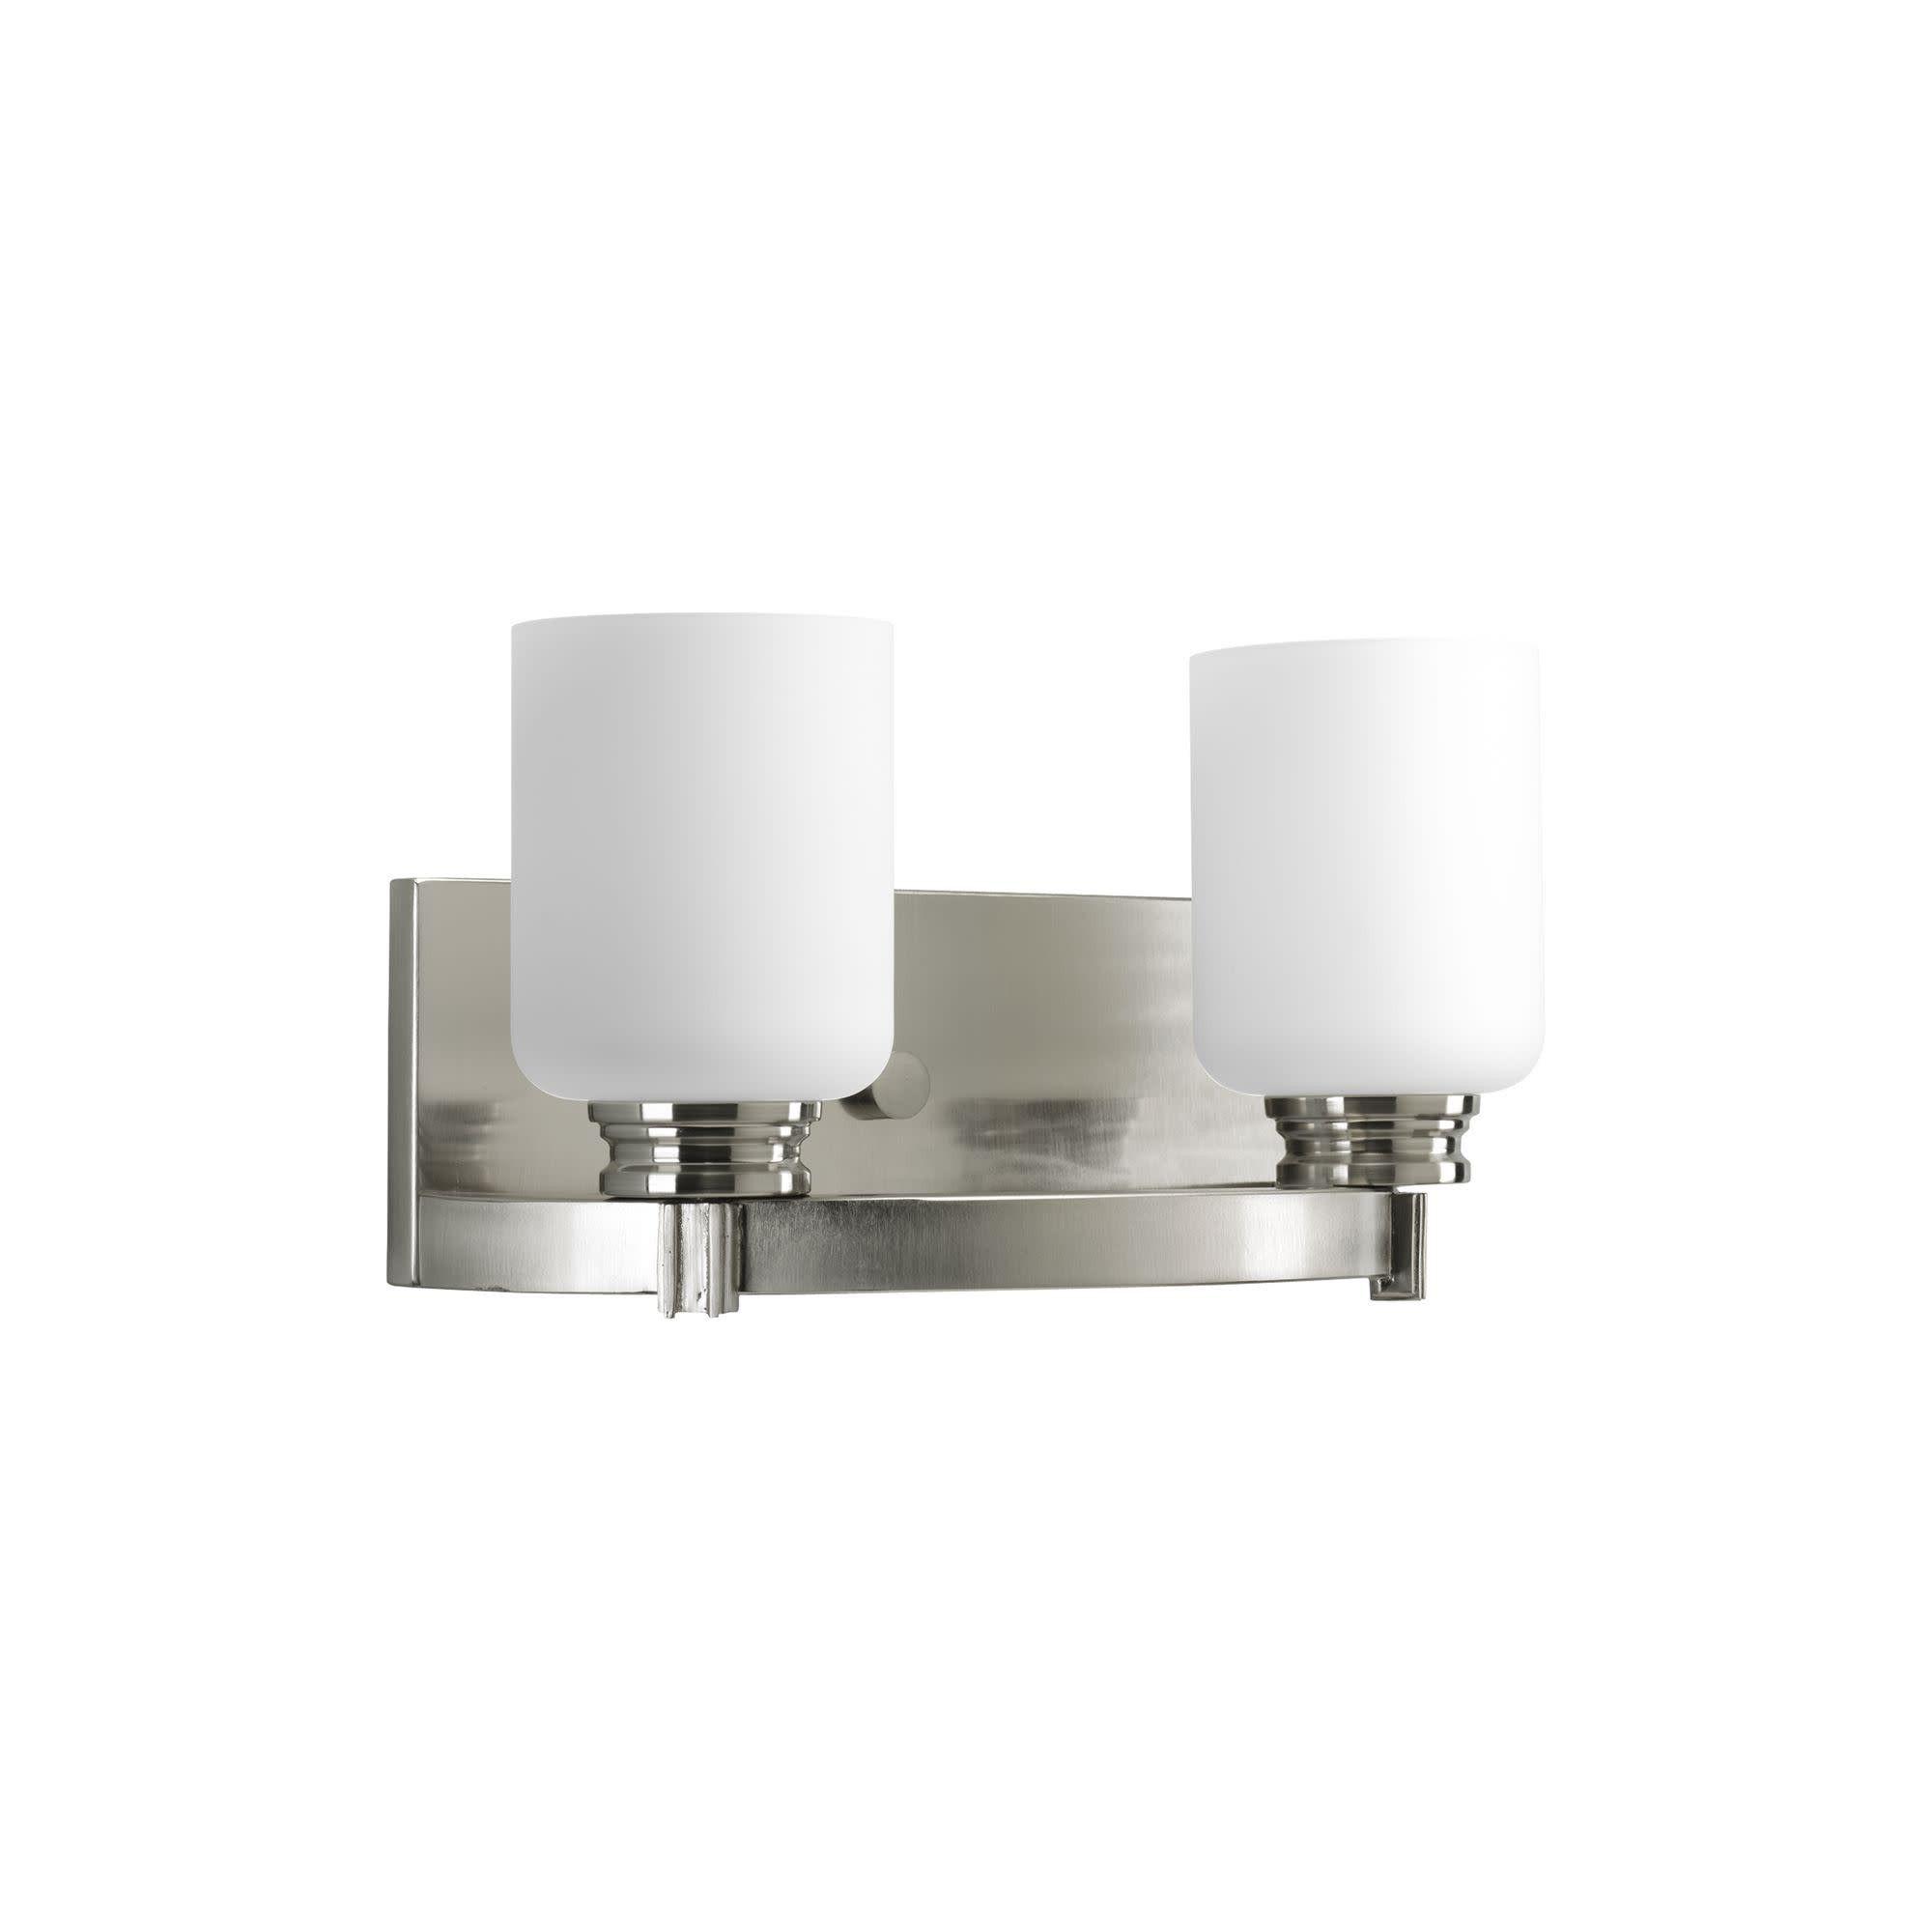 Photo of Progress Lighting P3057 Orbitz Two-Light Bathroom Fixture with White Opal Glass …